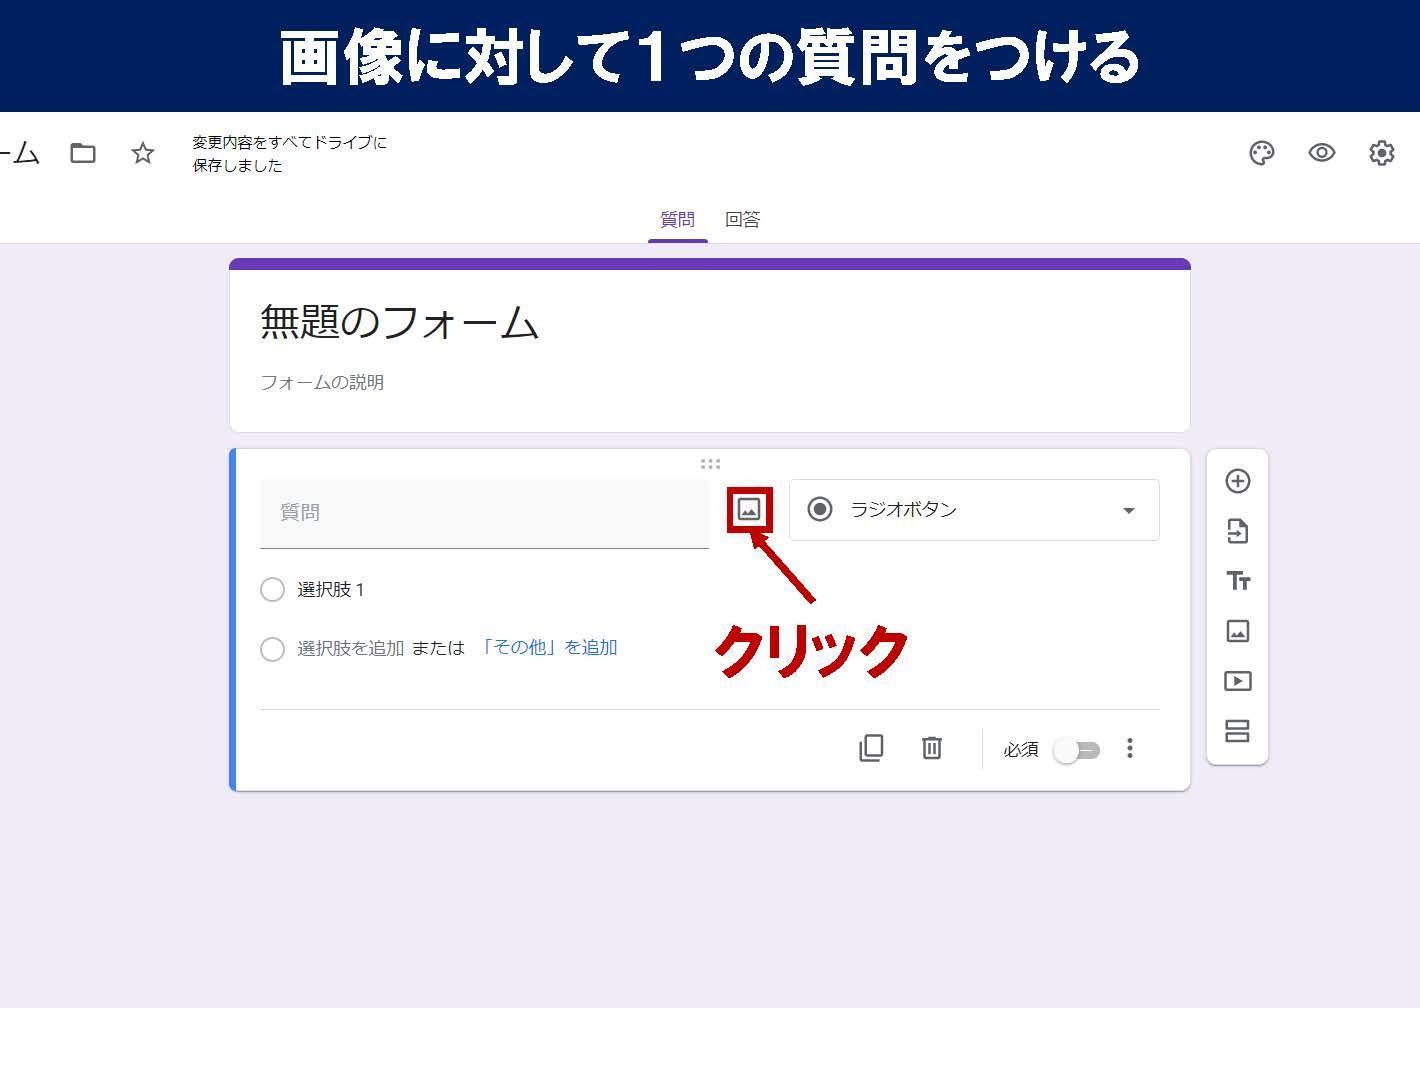 http://igs-kankan.com/article/3fd814c1f67619fbc1b3ab499d7b22072b2c68ef.jpg